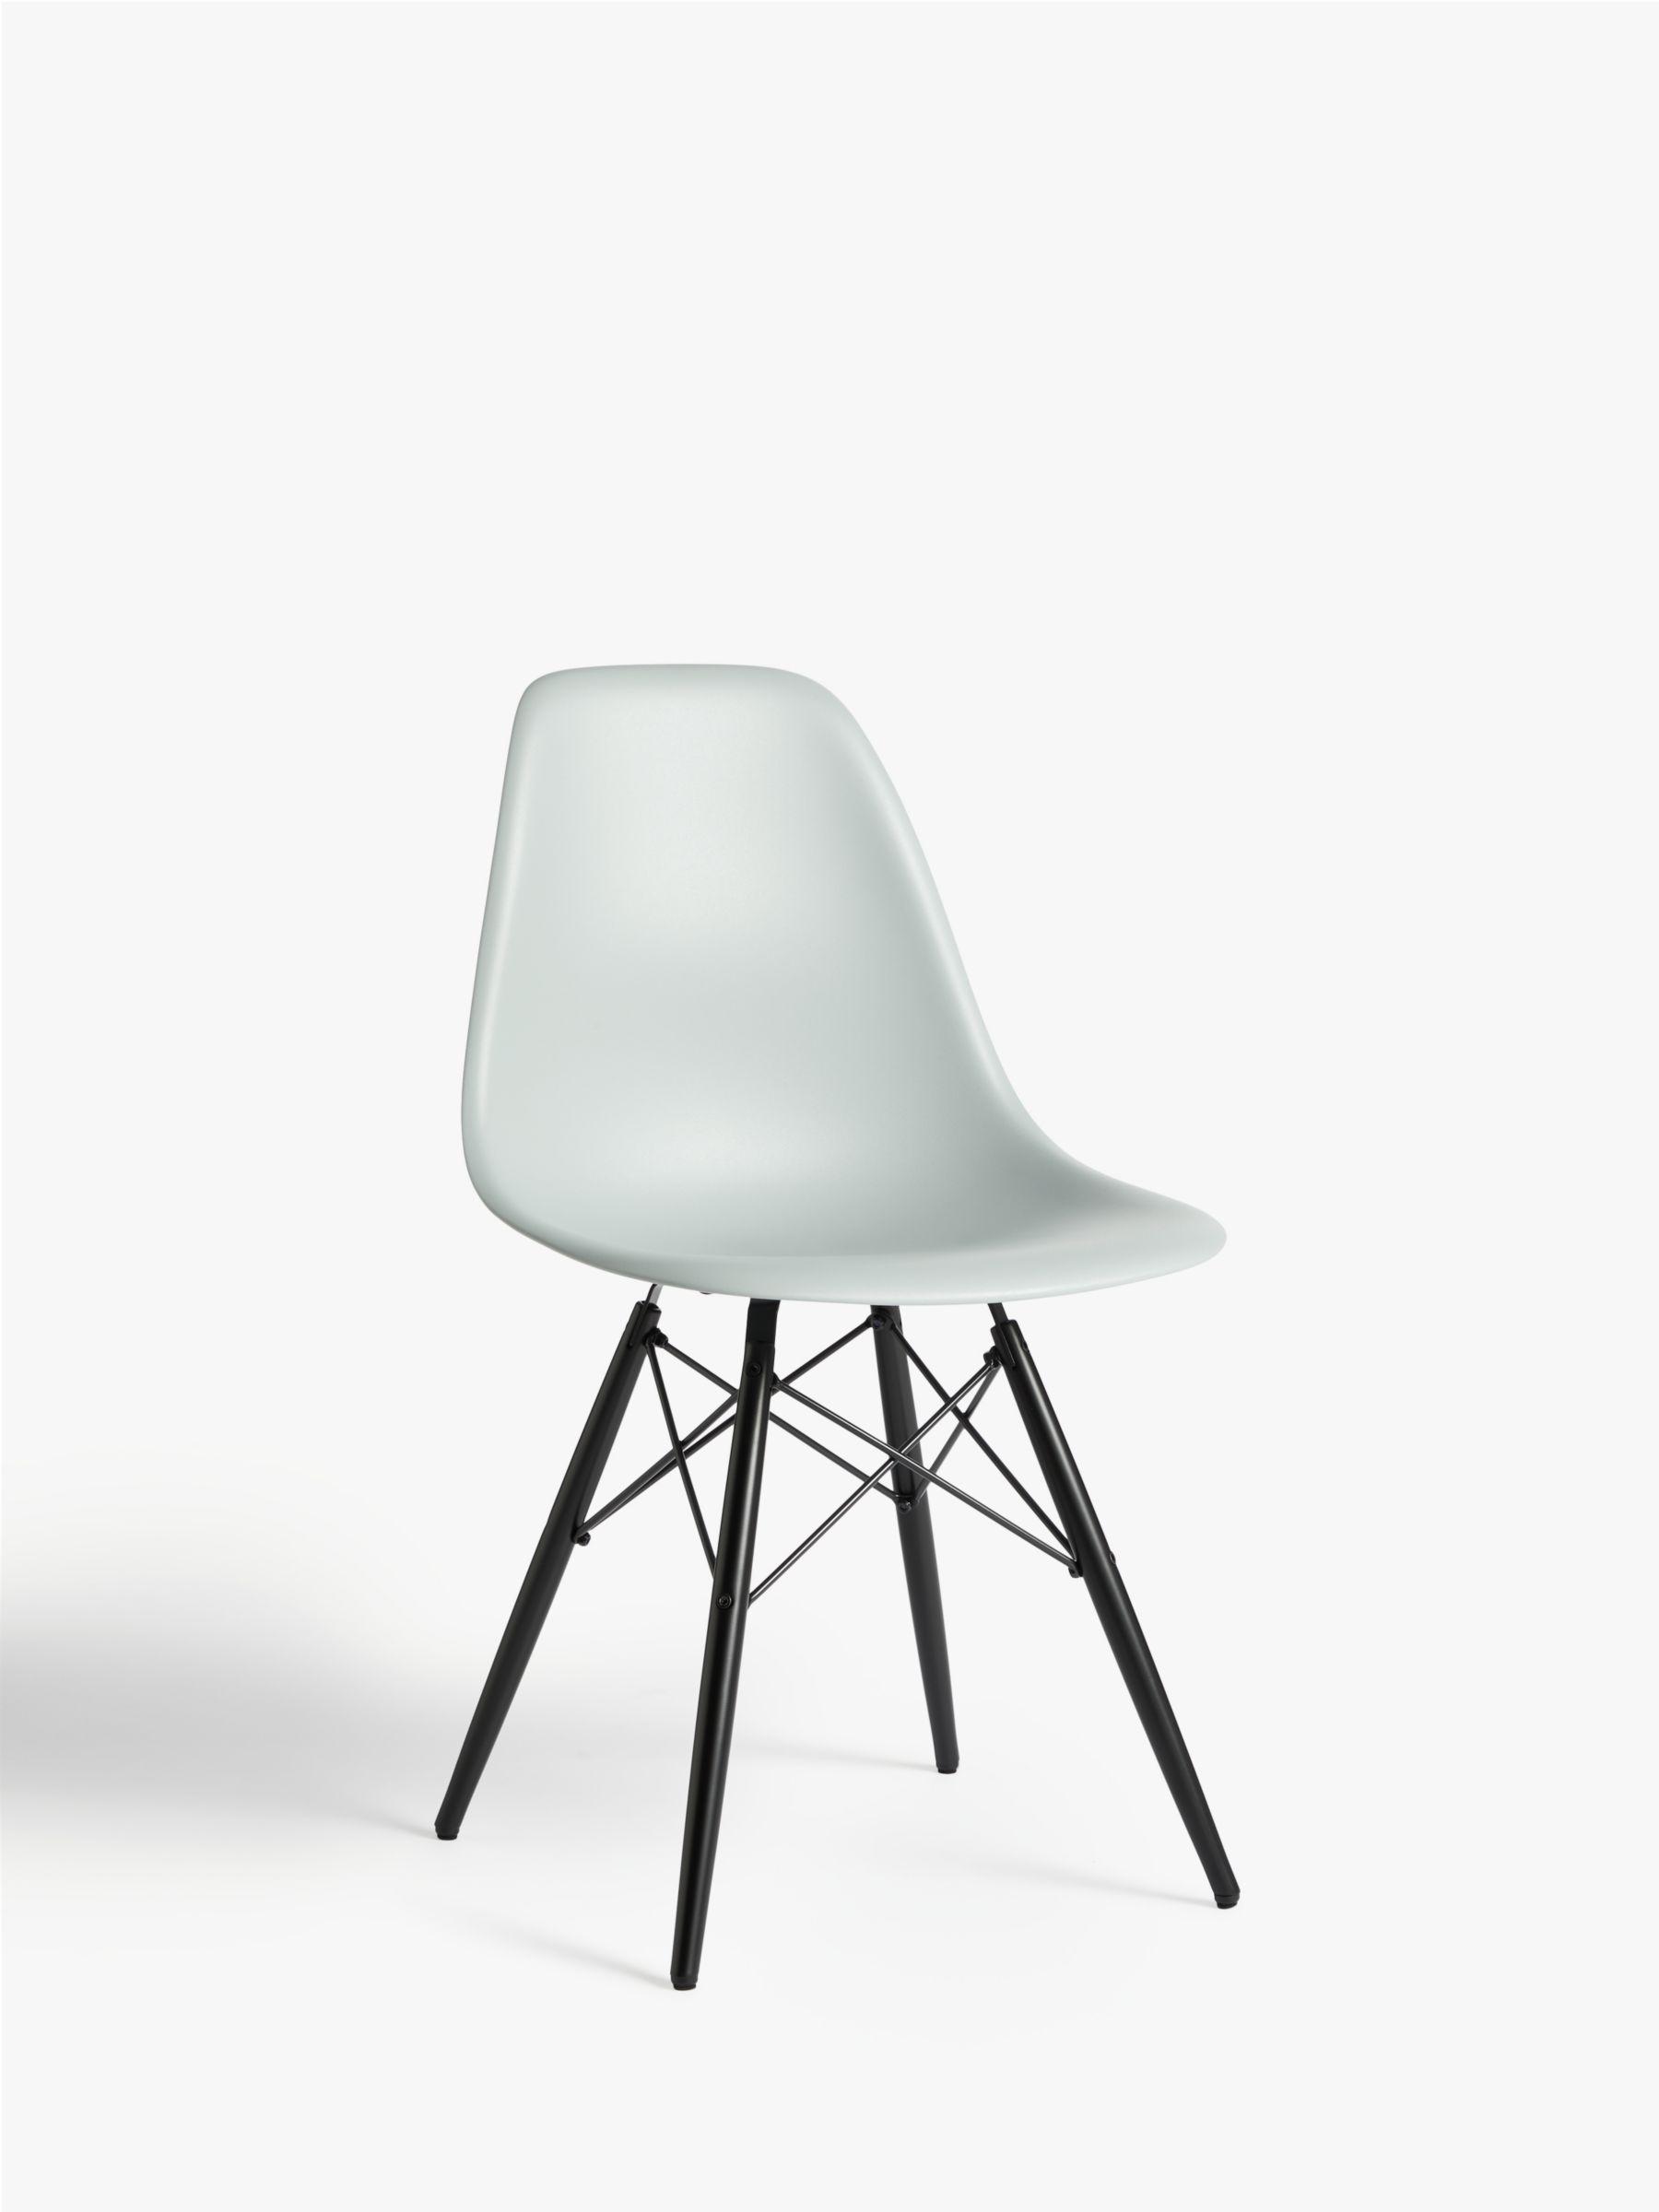 Vitra Vitra Eames DSW Side Chair, Black Maple Leg